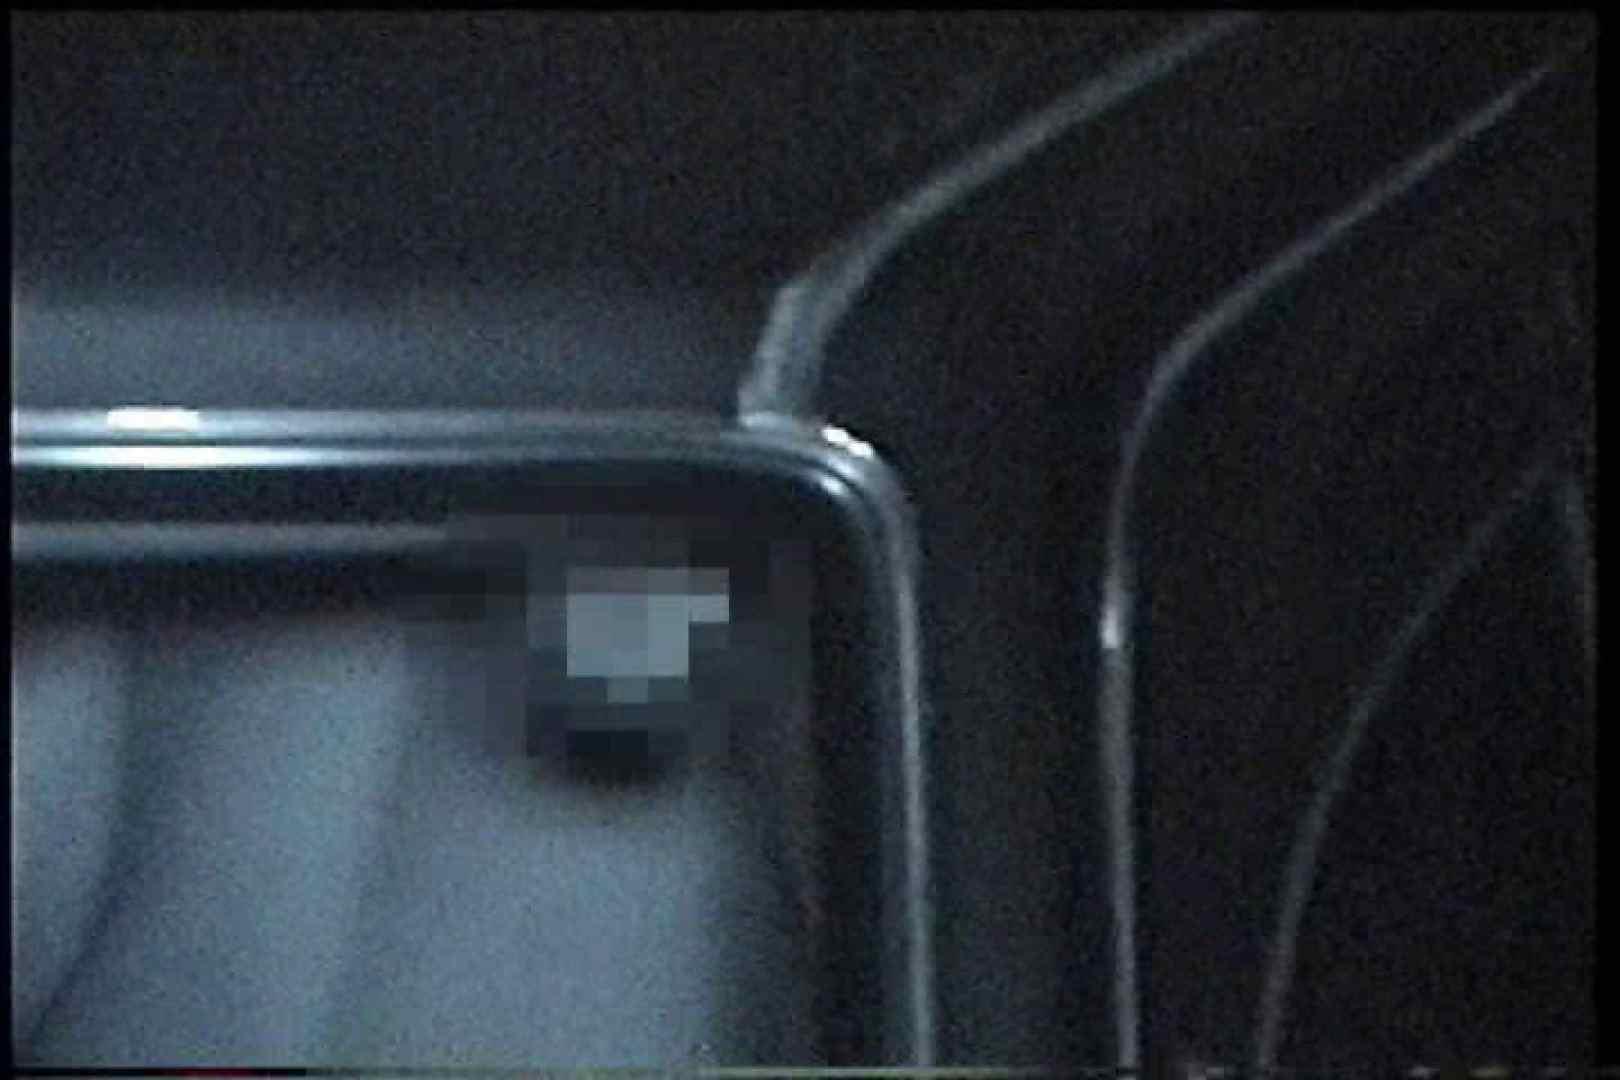 充血監督の深夜の運動会Vol.169 乳首 戯れ無修正画像 71画像 34